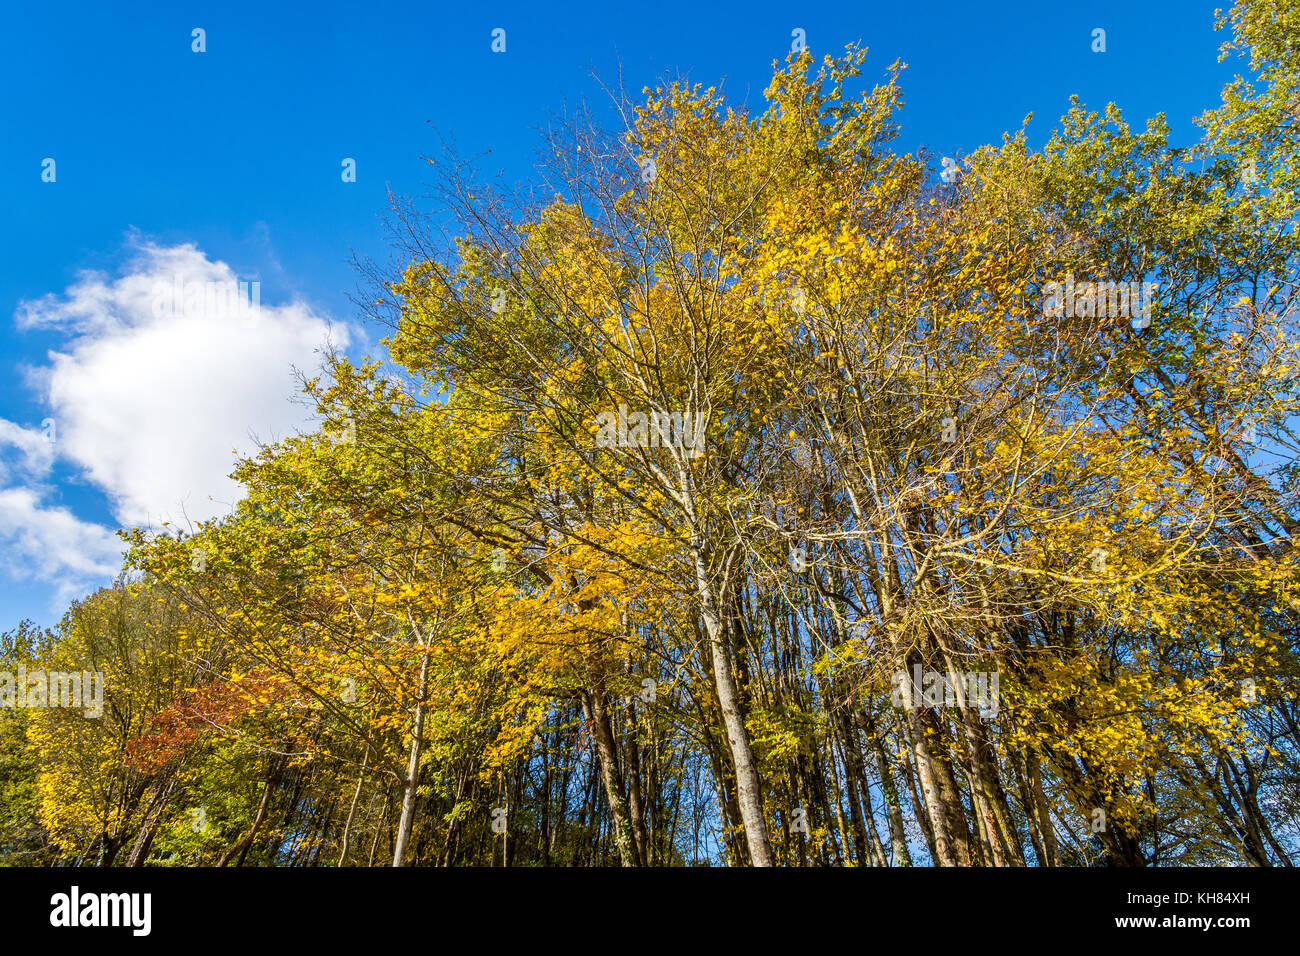 Autumn foliage in mixed woodland - France. - Stock Image